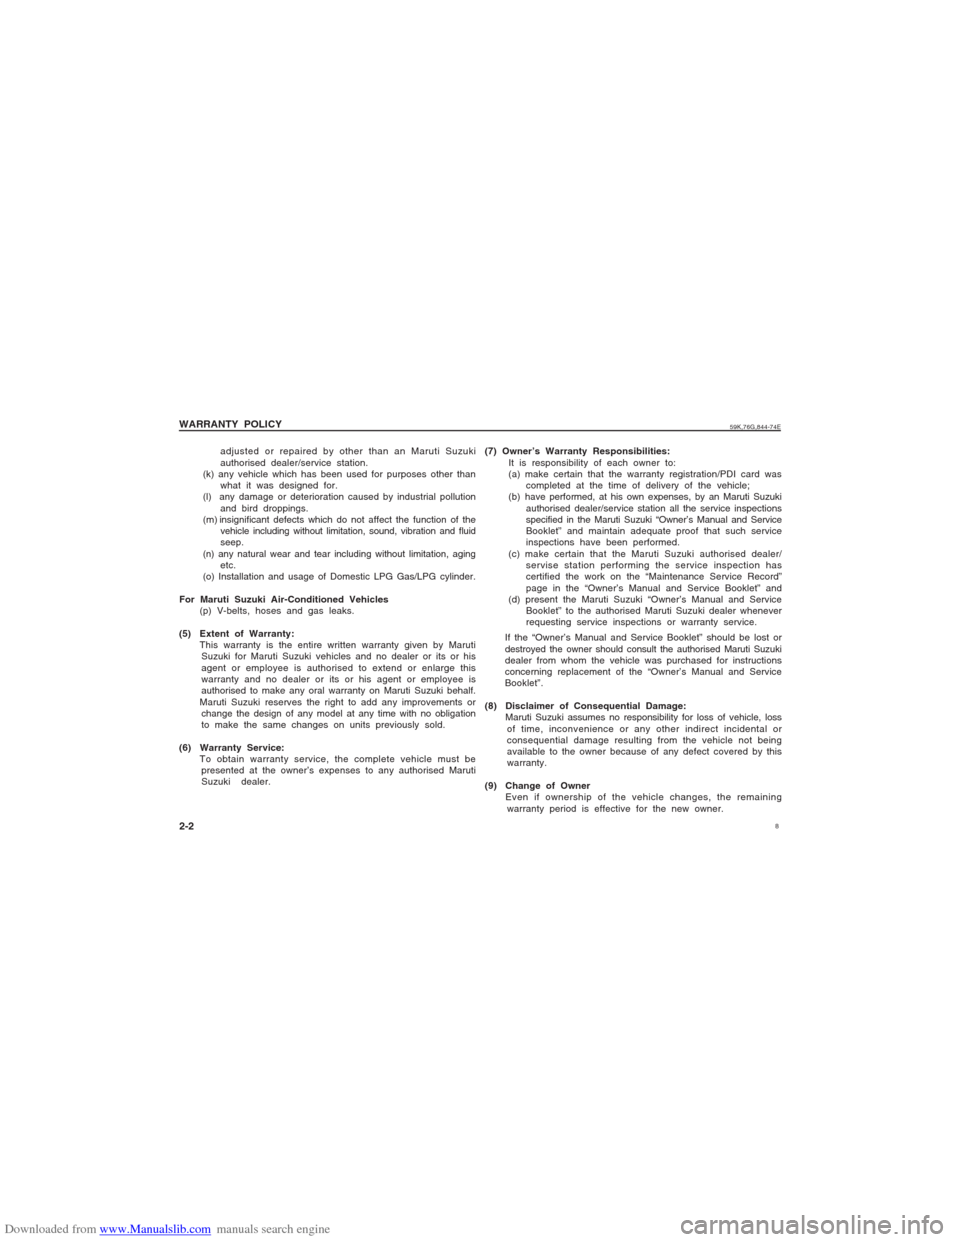 SUZUKI ALTO 2007 6.G Owners Manual